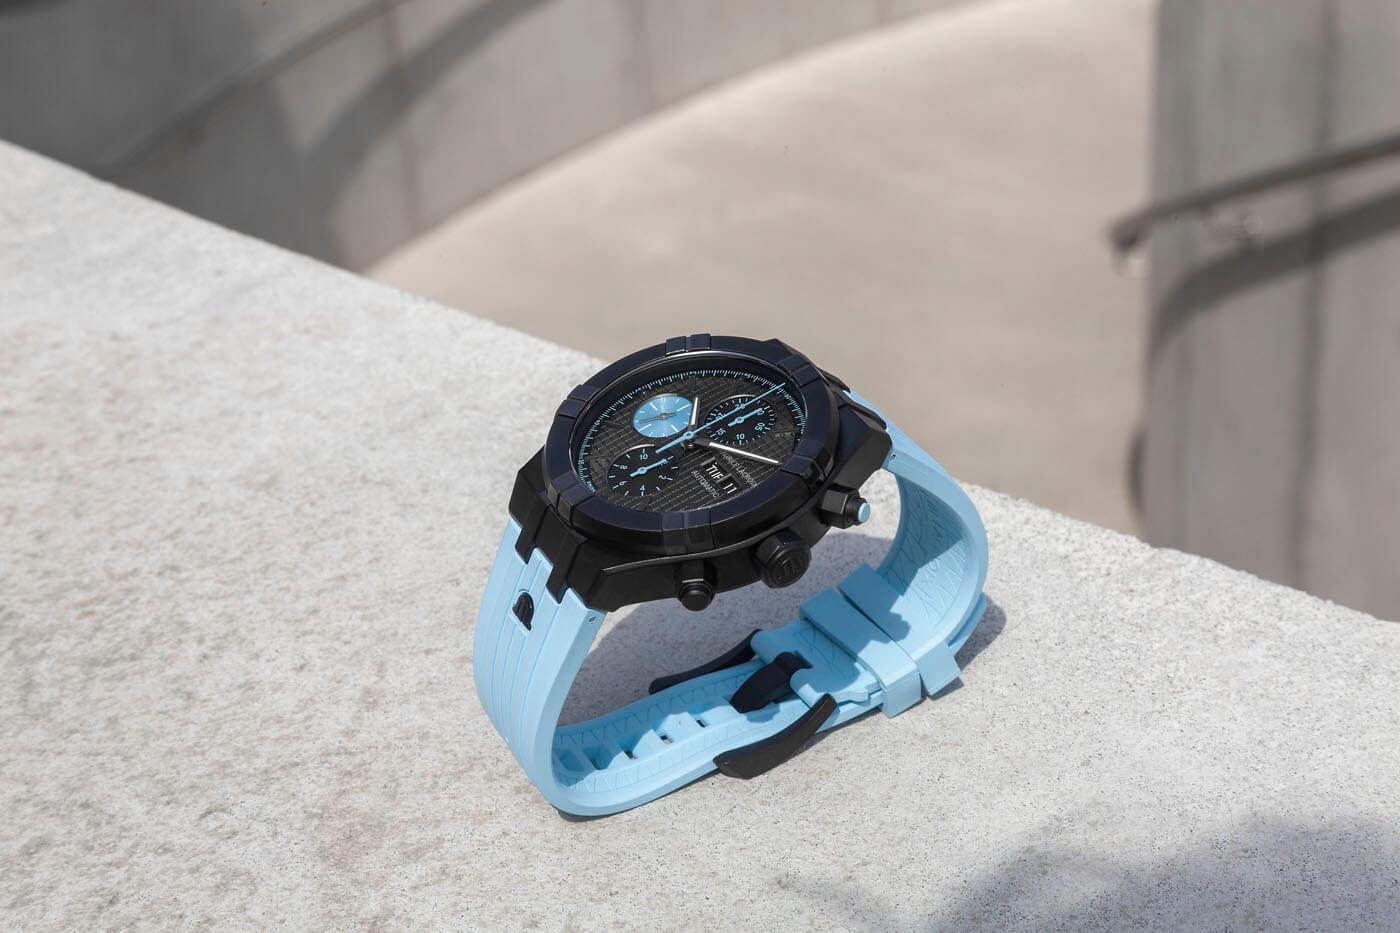 Maurice Lacroix Aikon Automatic Chronograph Sprint 3